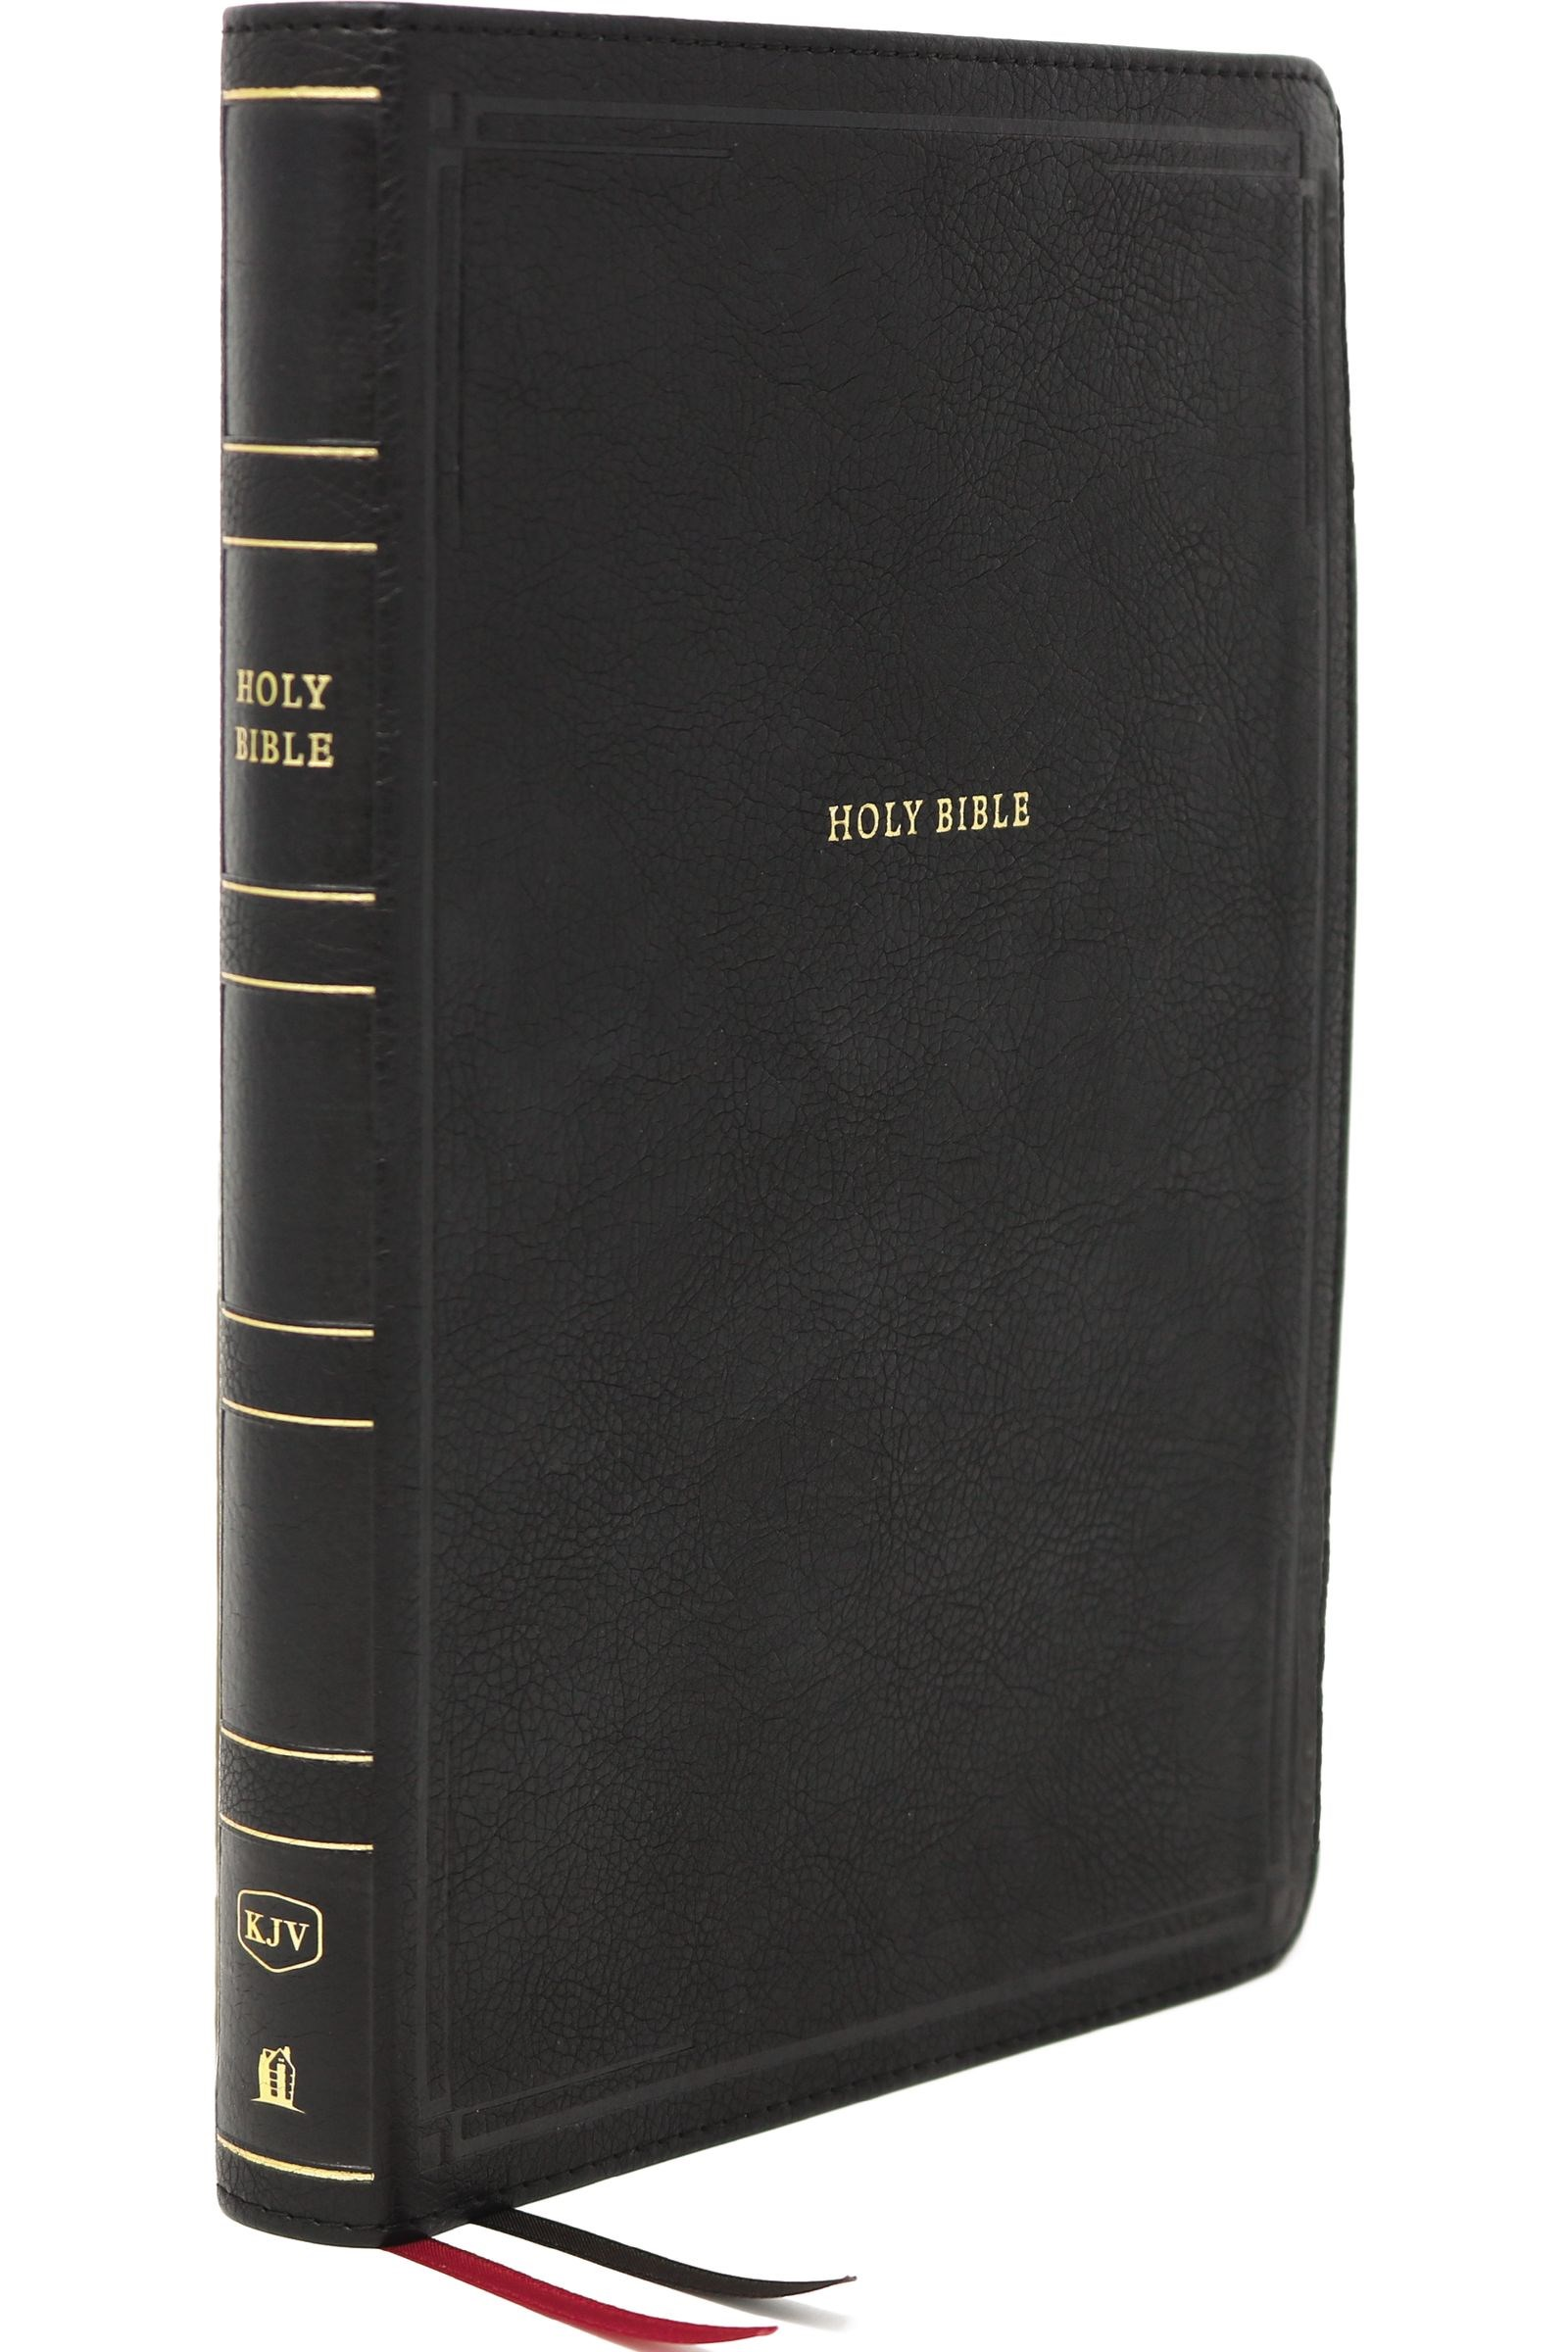 KJV Thinline Bible/Giant Print (Comfort Print)-Black Leathersoft Indexed